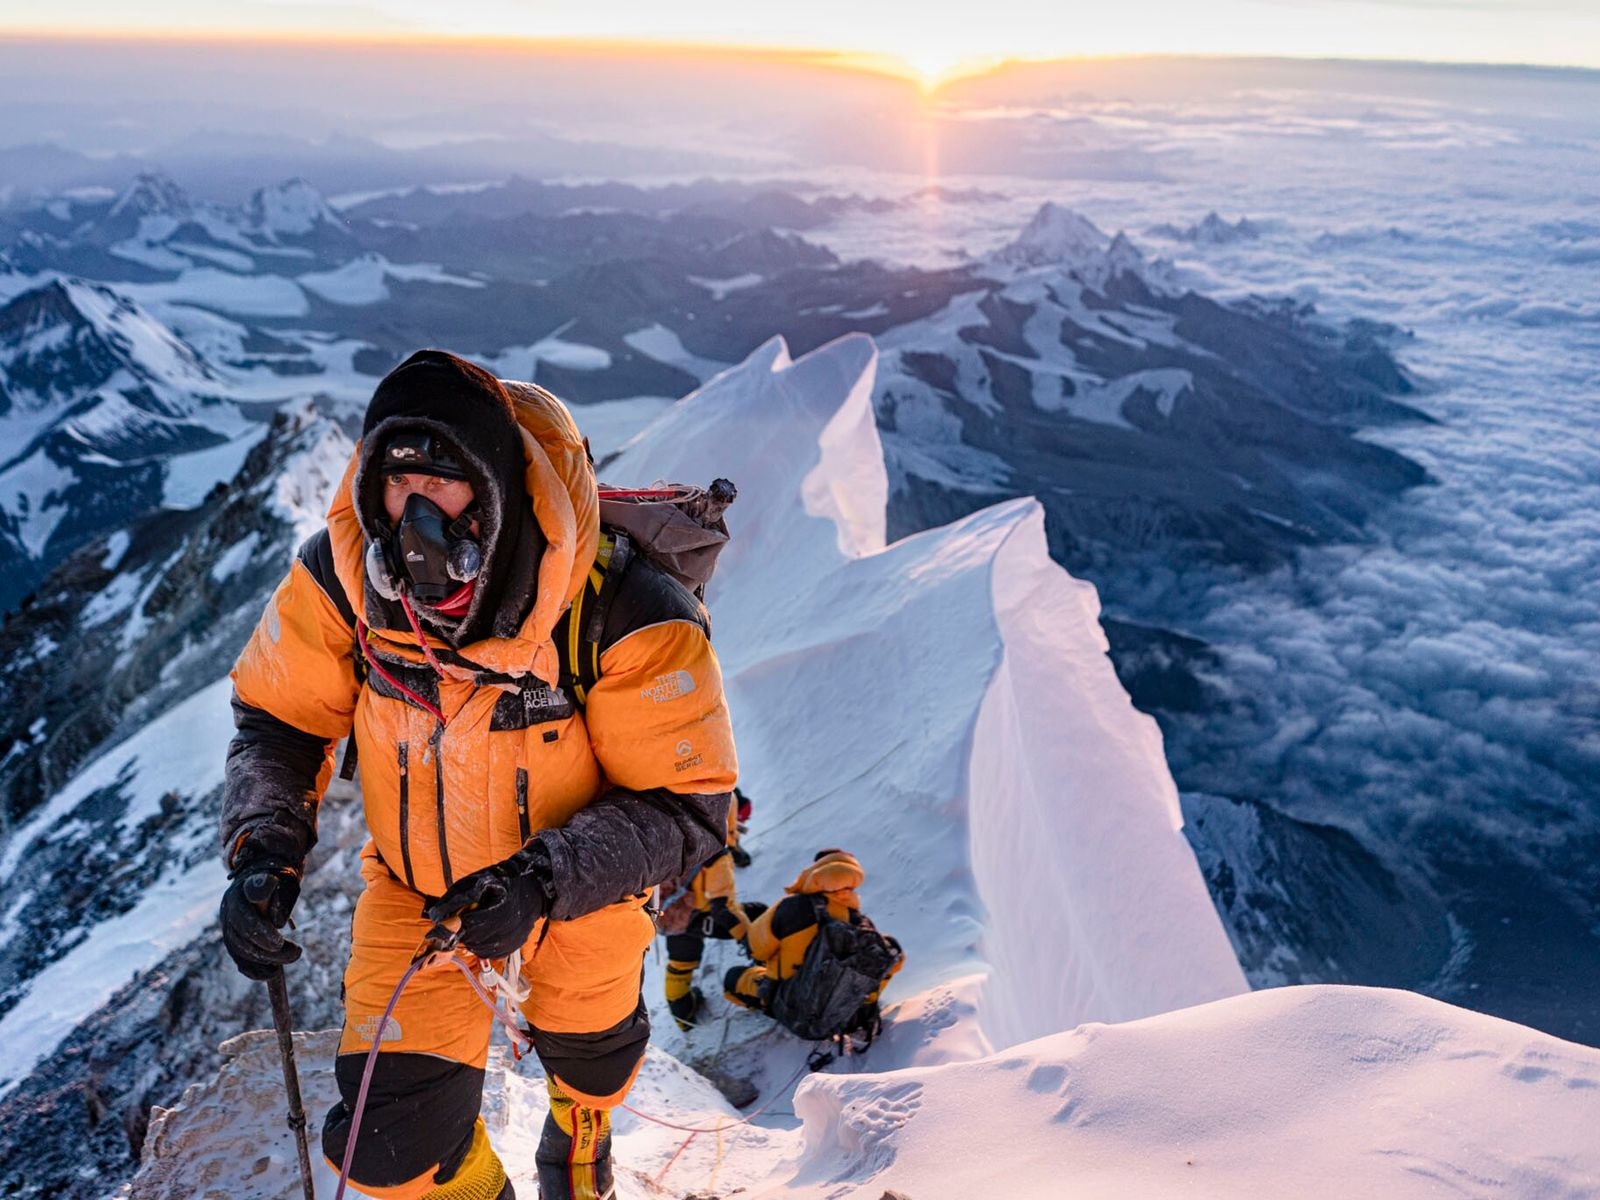 Mark Synnott climbs Everest's North Face